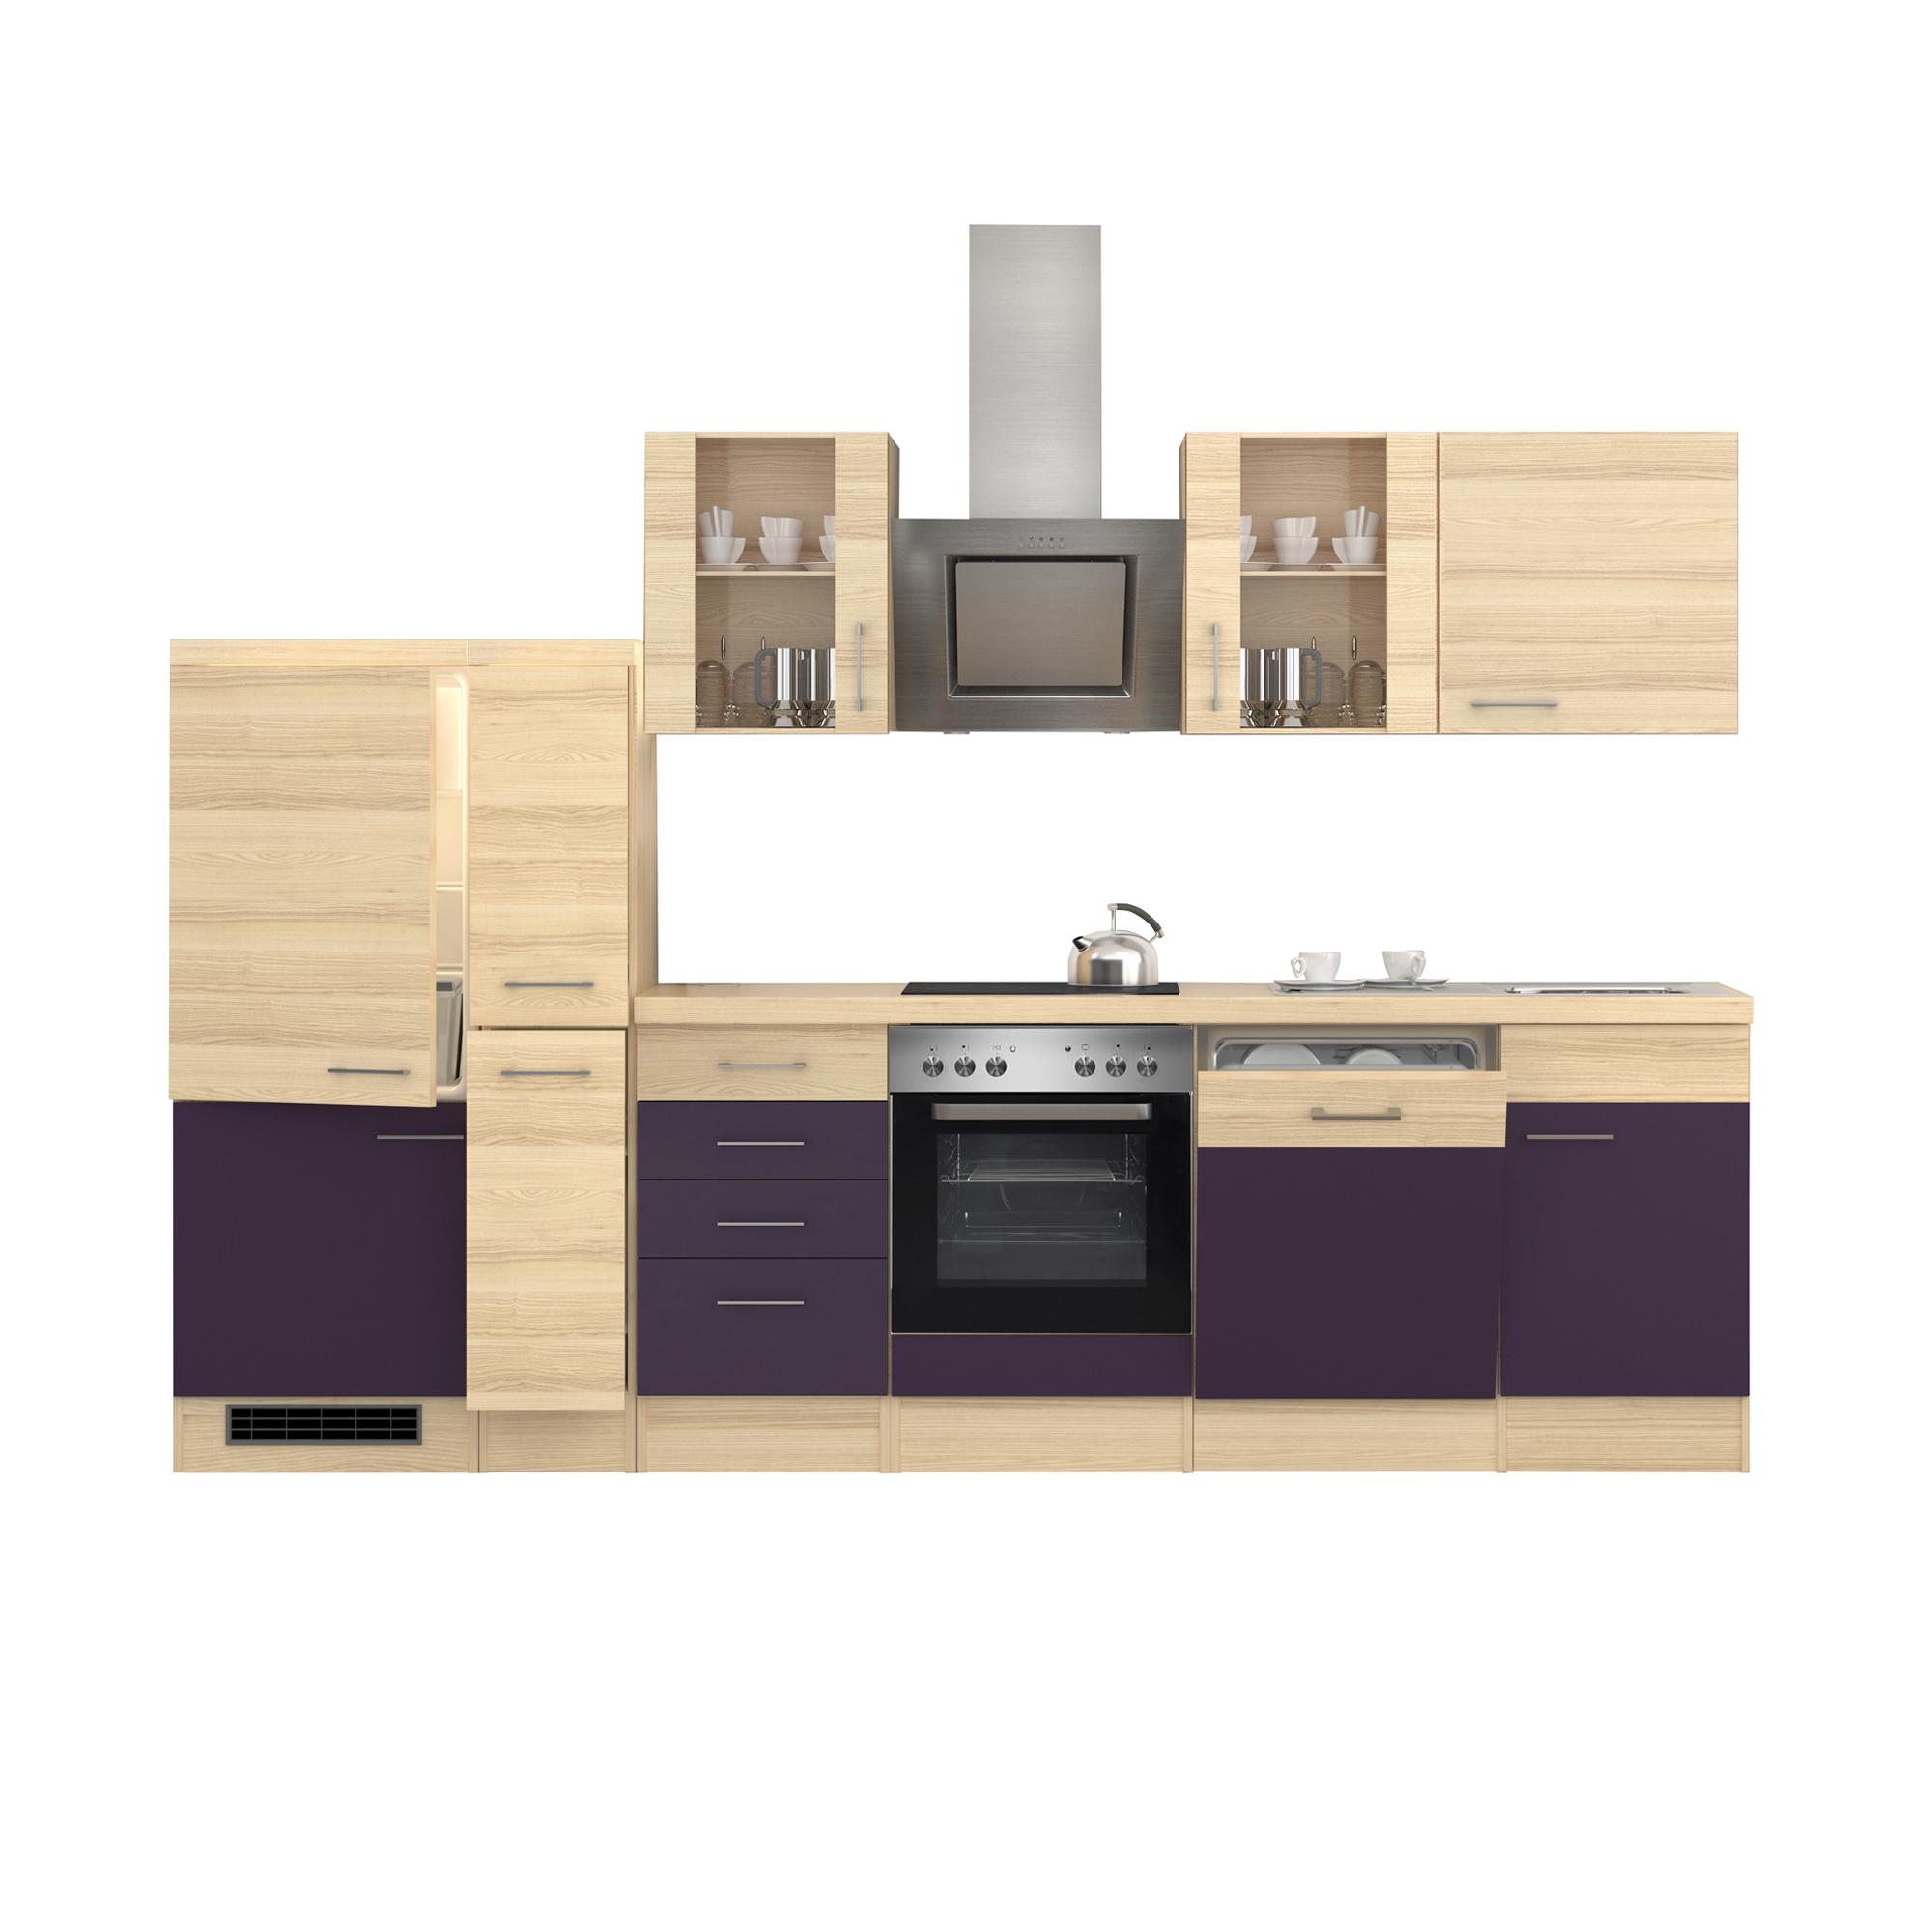 k chenzeile focus e ger te 2 glash nger 15 teilig breite 310 cm aubergine k che k chenzeilen. Black Bedroom Furniture Sets. Home Design Ideas